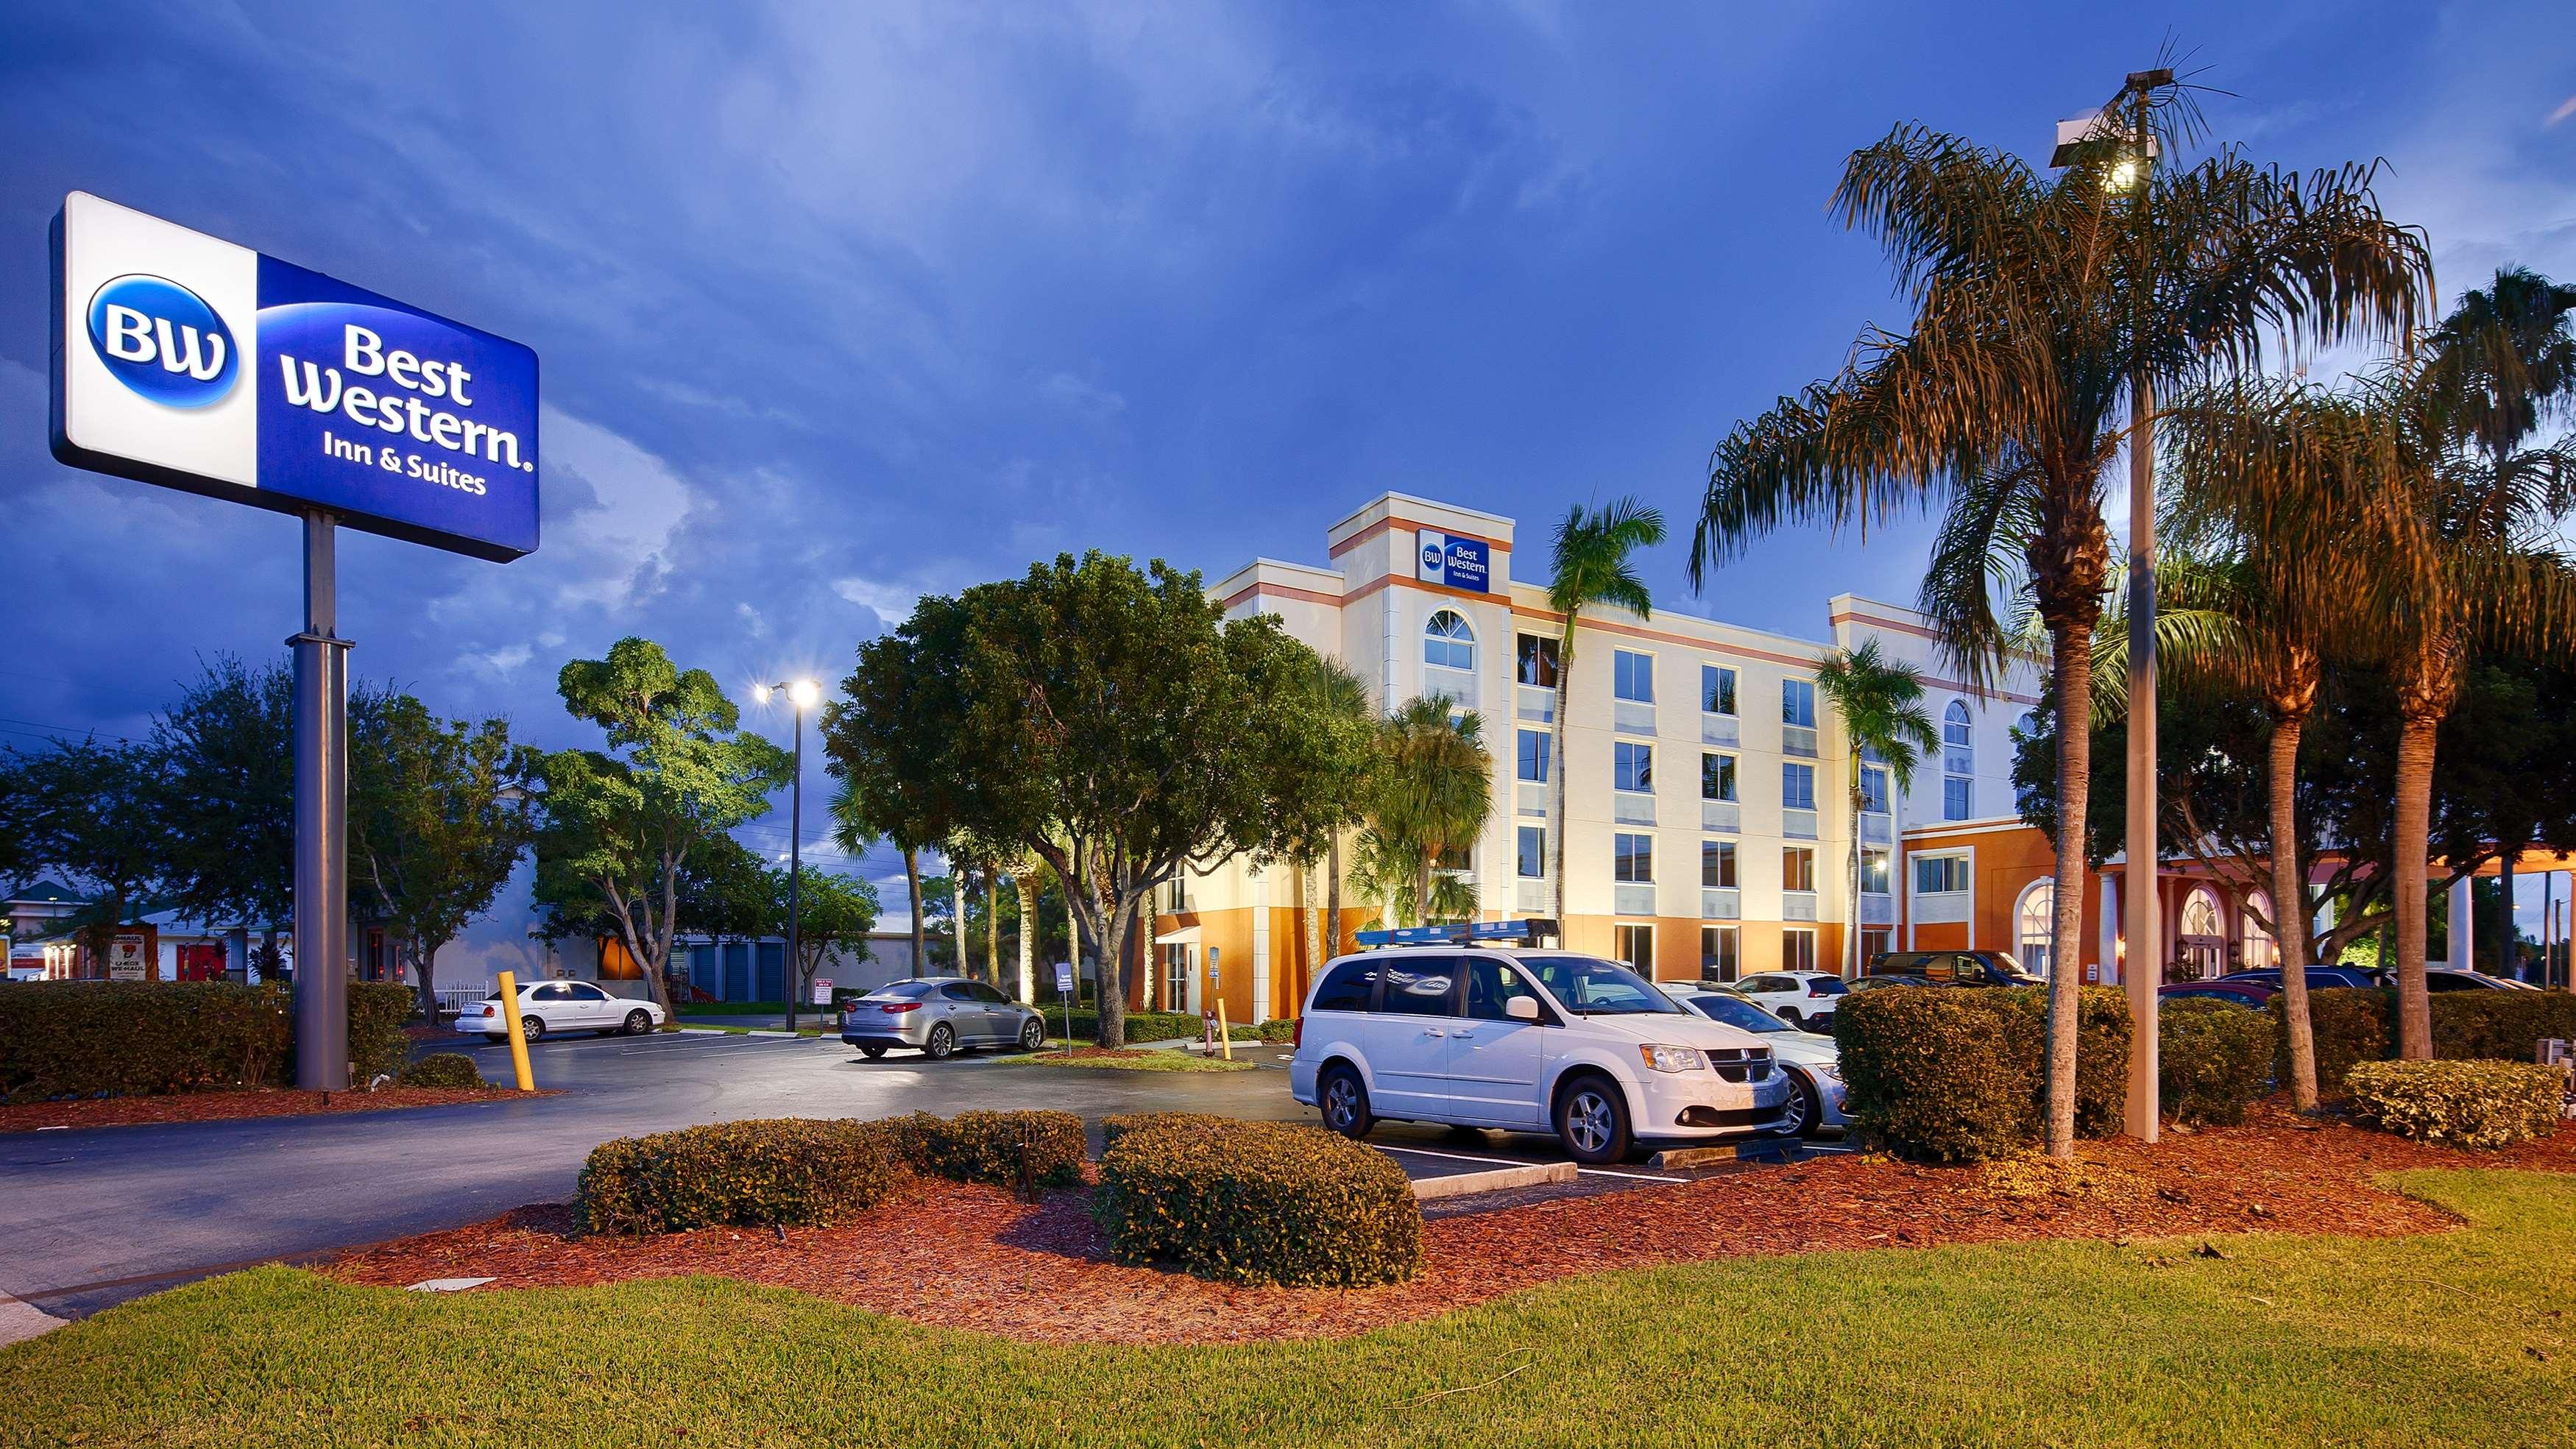 Best Western Fort Myers Inn & Suites image 0